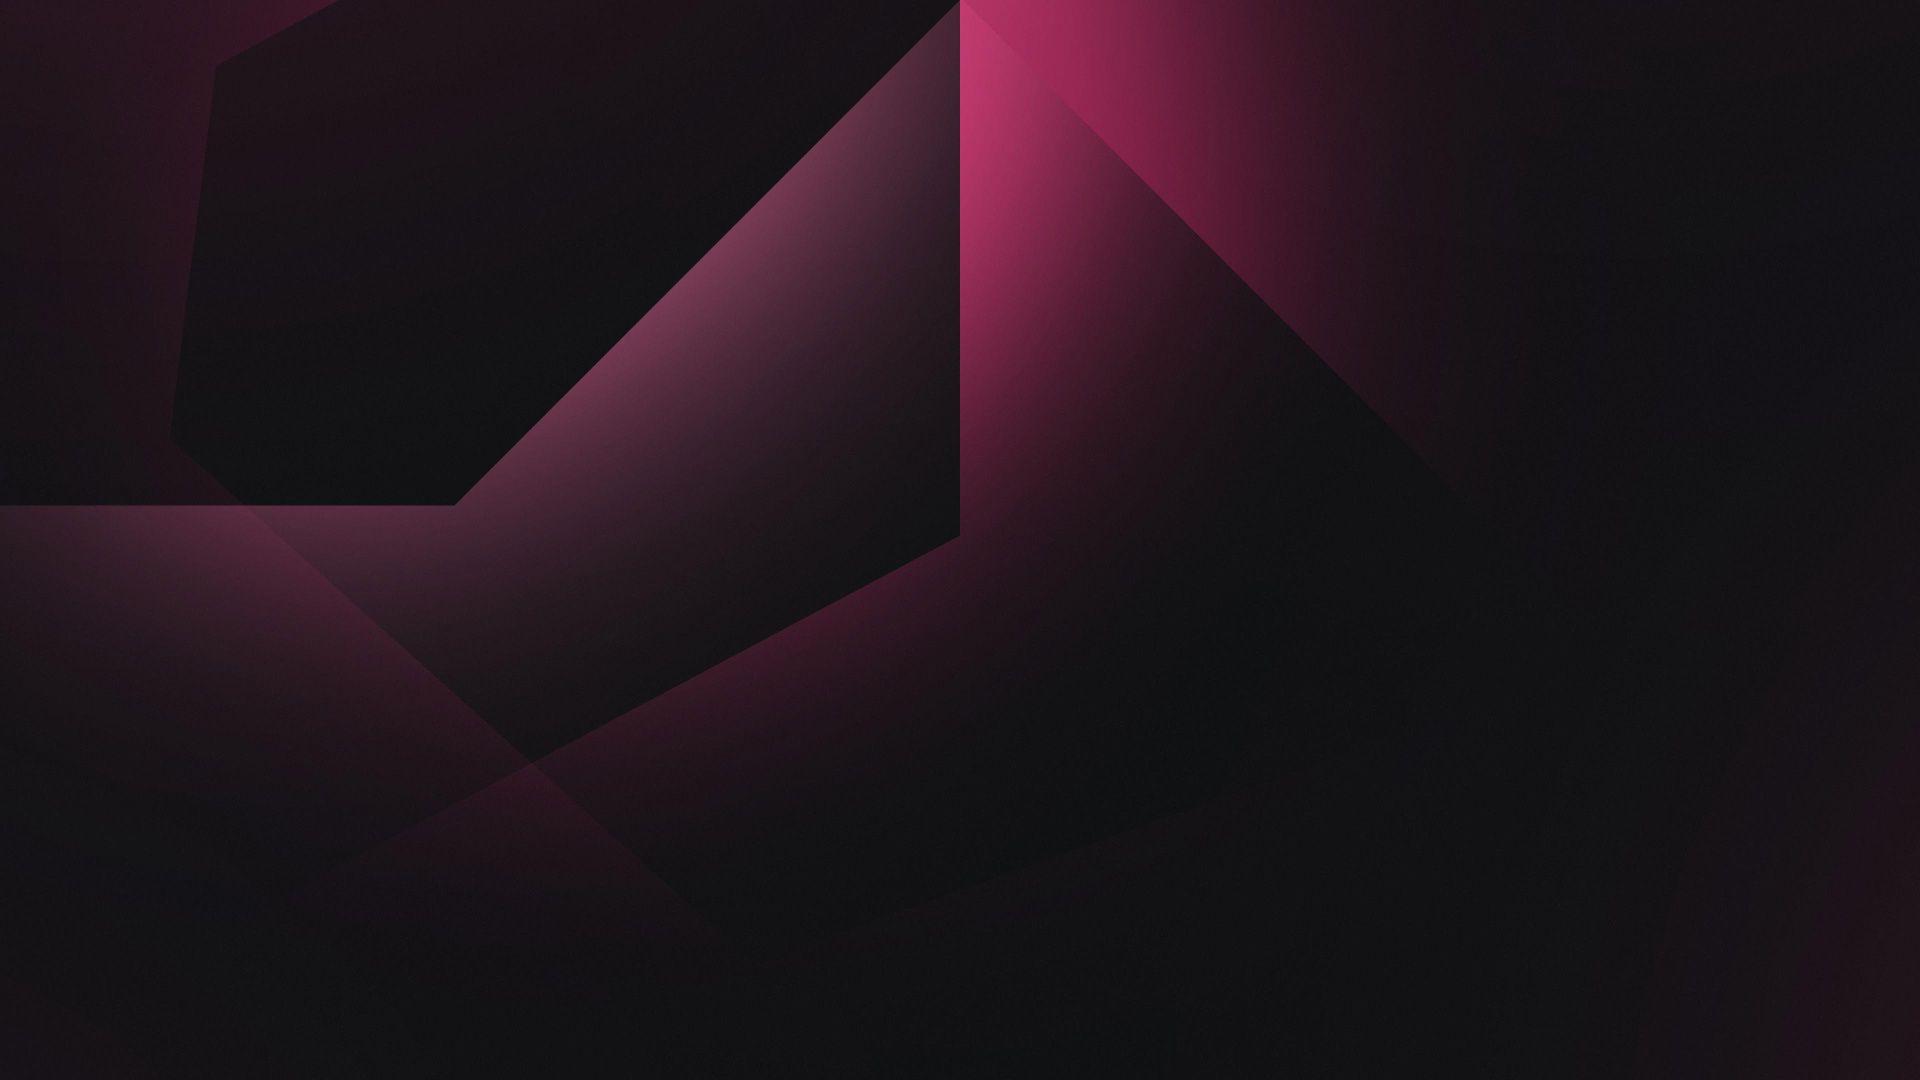 Download 1920x1080 Wallpaper Abstract Dark Gradient Pink Full Hd Hdtv Fhd 1080p 1920x1080 Hd Image Backgro Abstract Wallpaper Dark Wallpaper Wallpaper